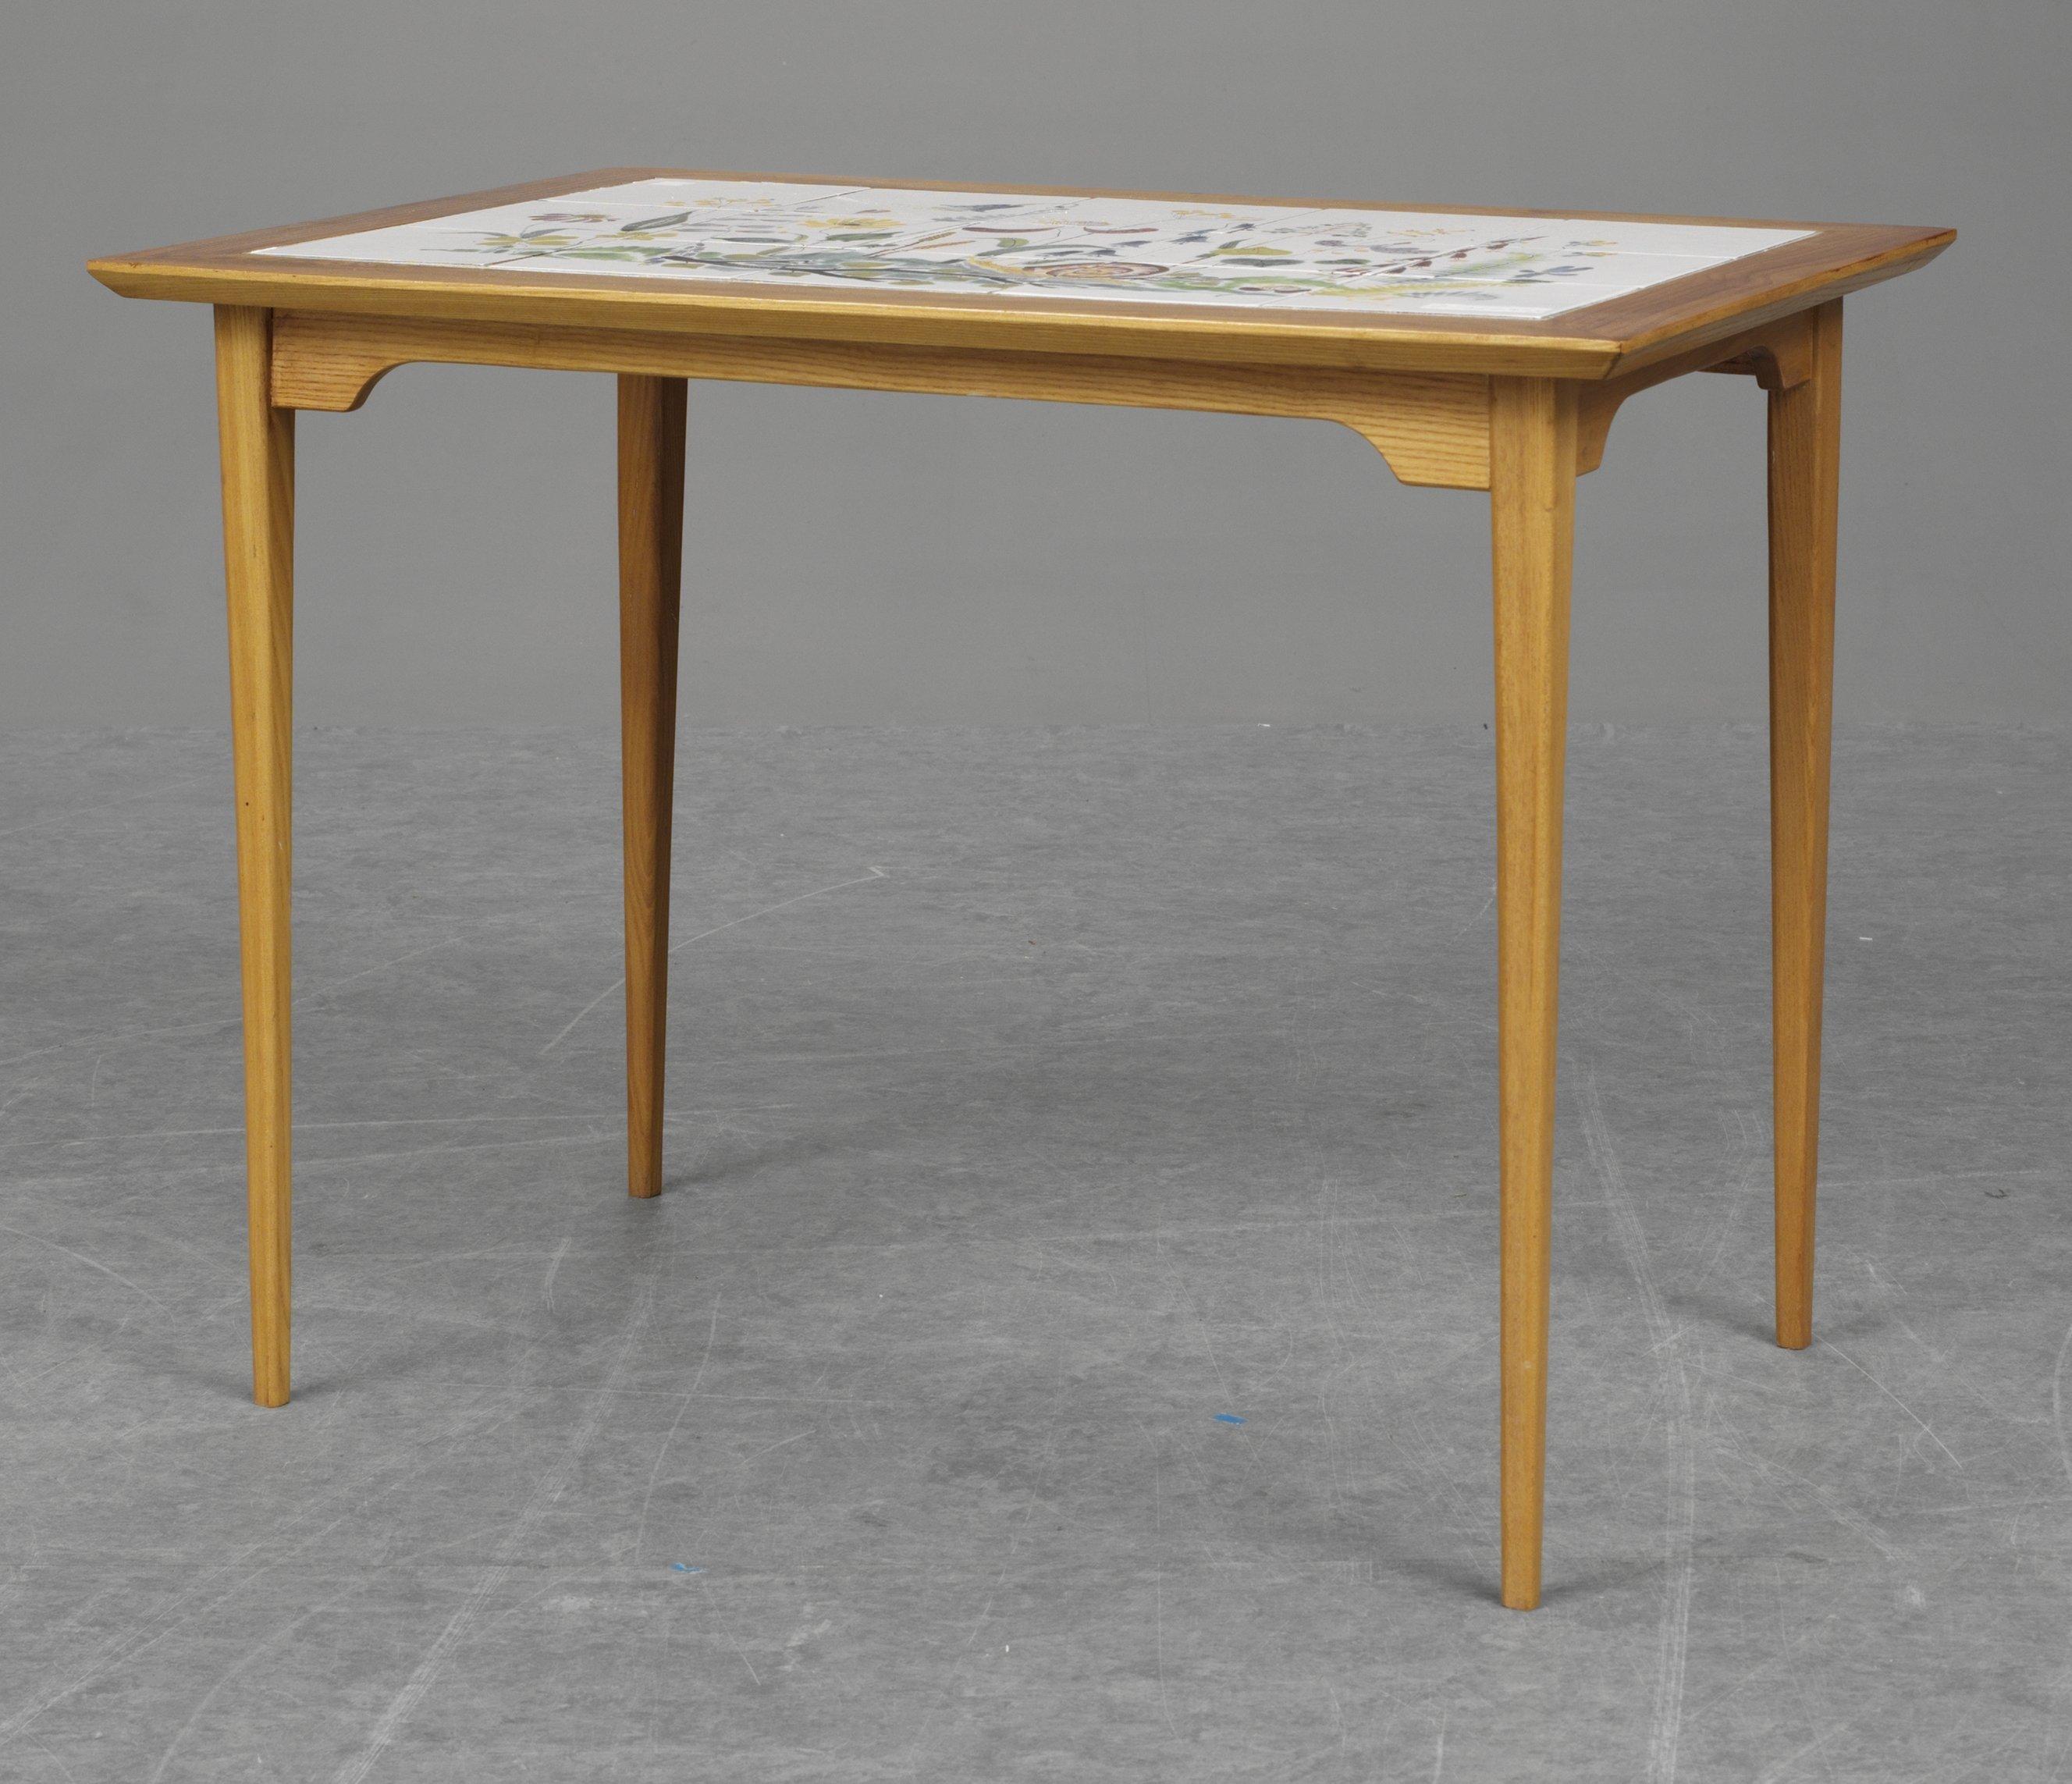 Bord med kakelplattor, fajans, ursula printz, gustavsberg studio ...